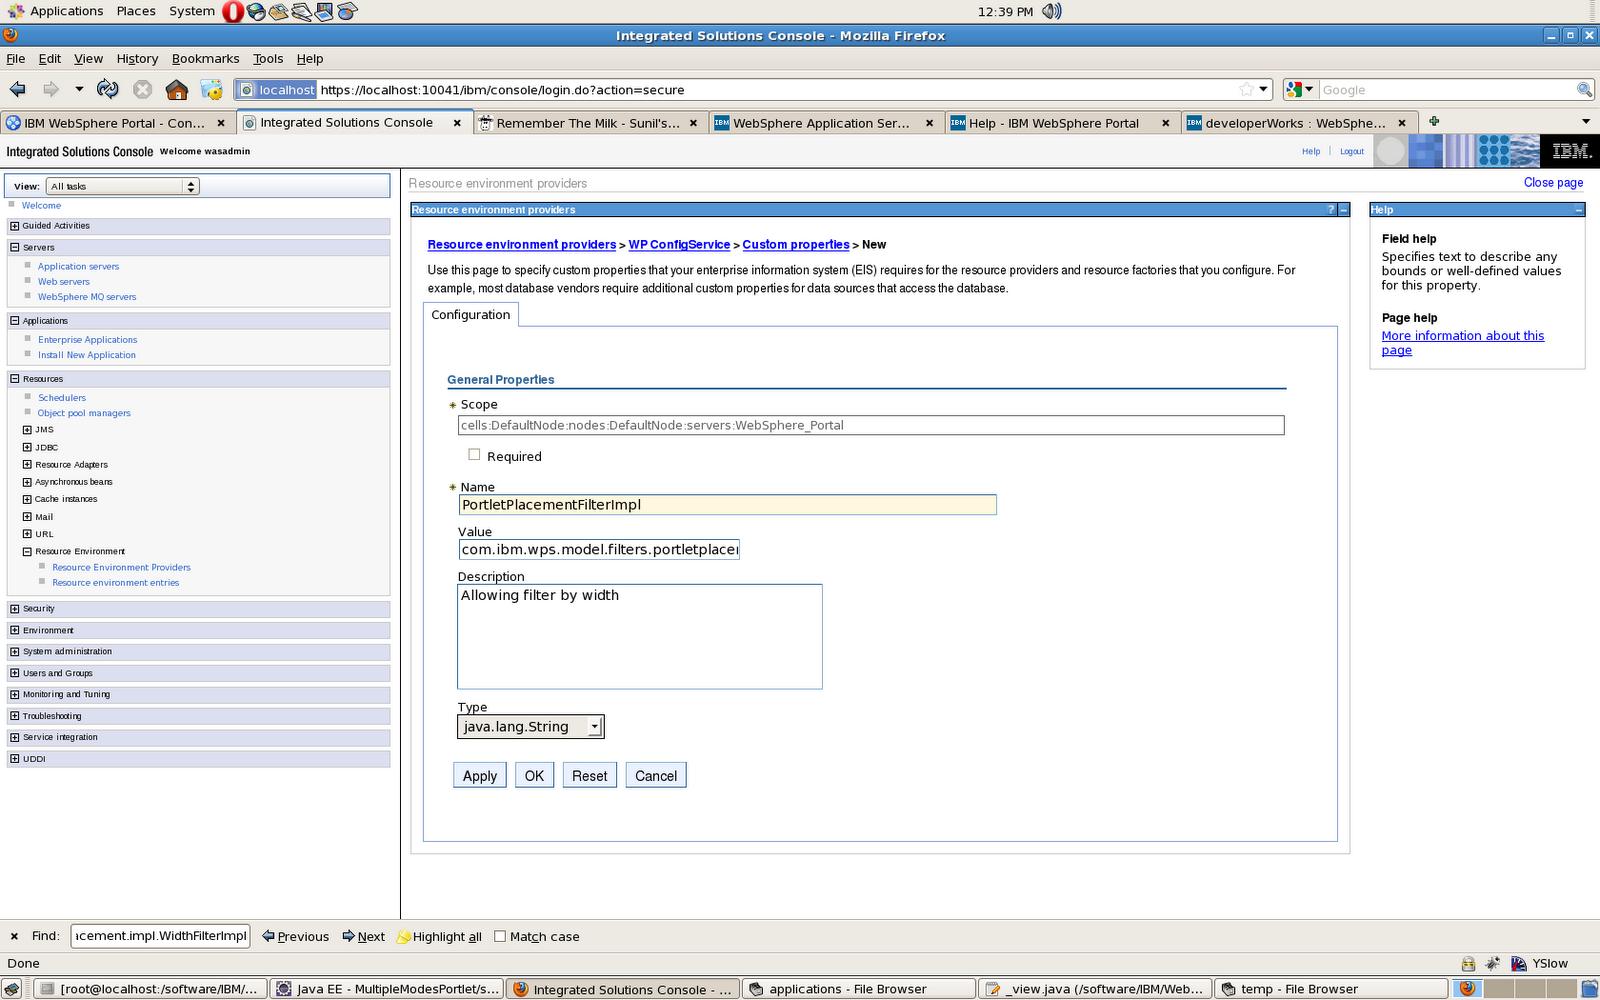 Ibm graphic representation of mail next homepage